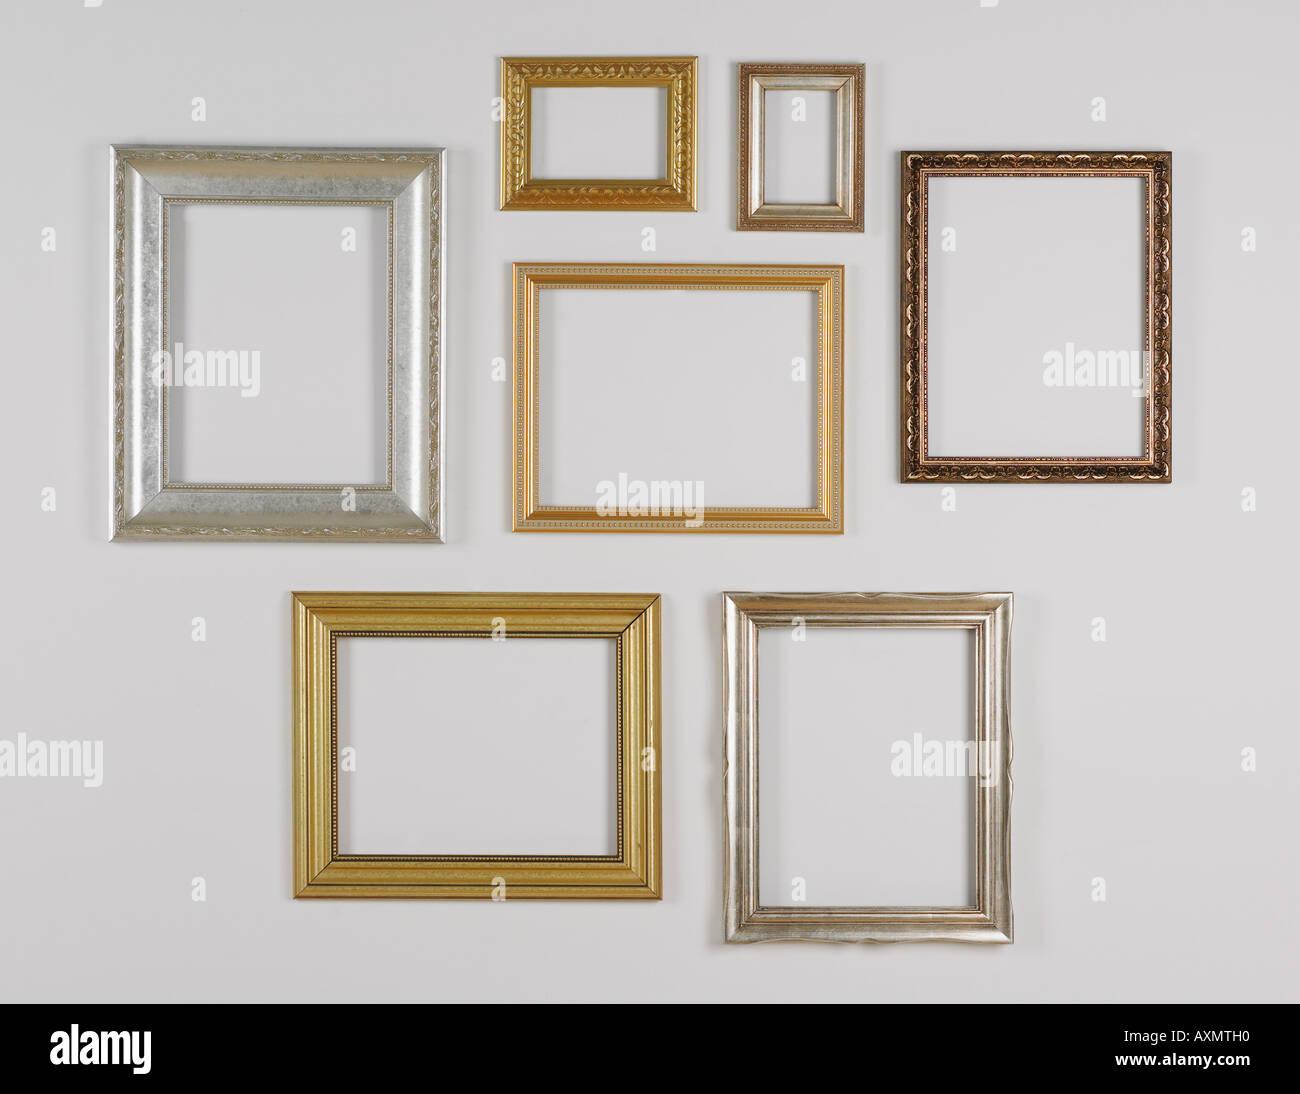 Rectangular Frames Imágenes De Stock & Rectangular Frames Fotos De ...